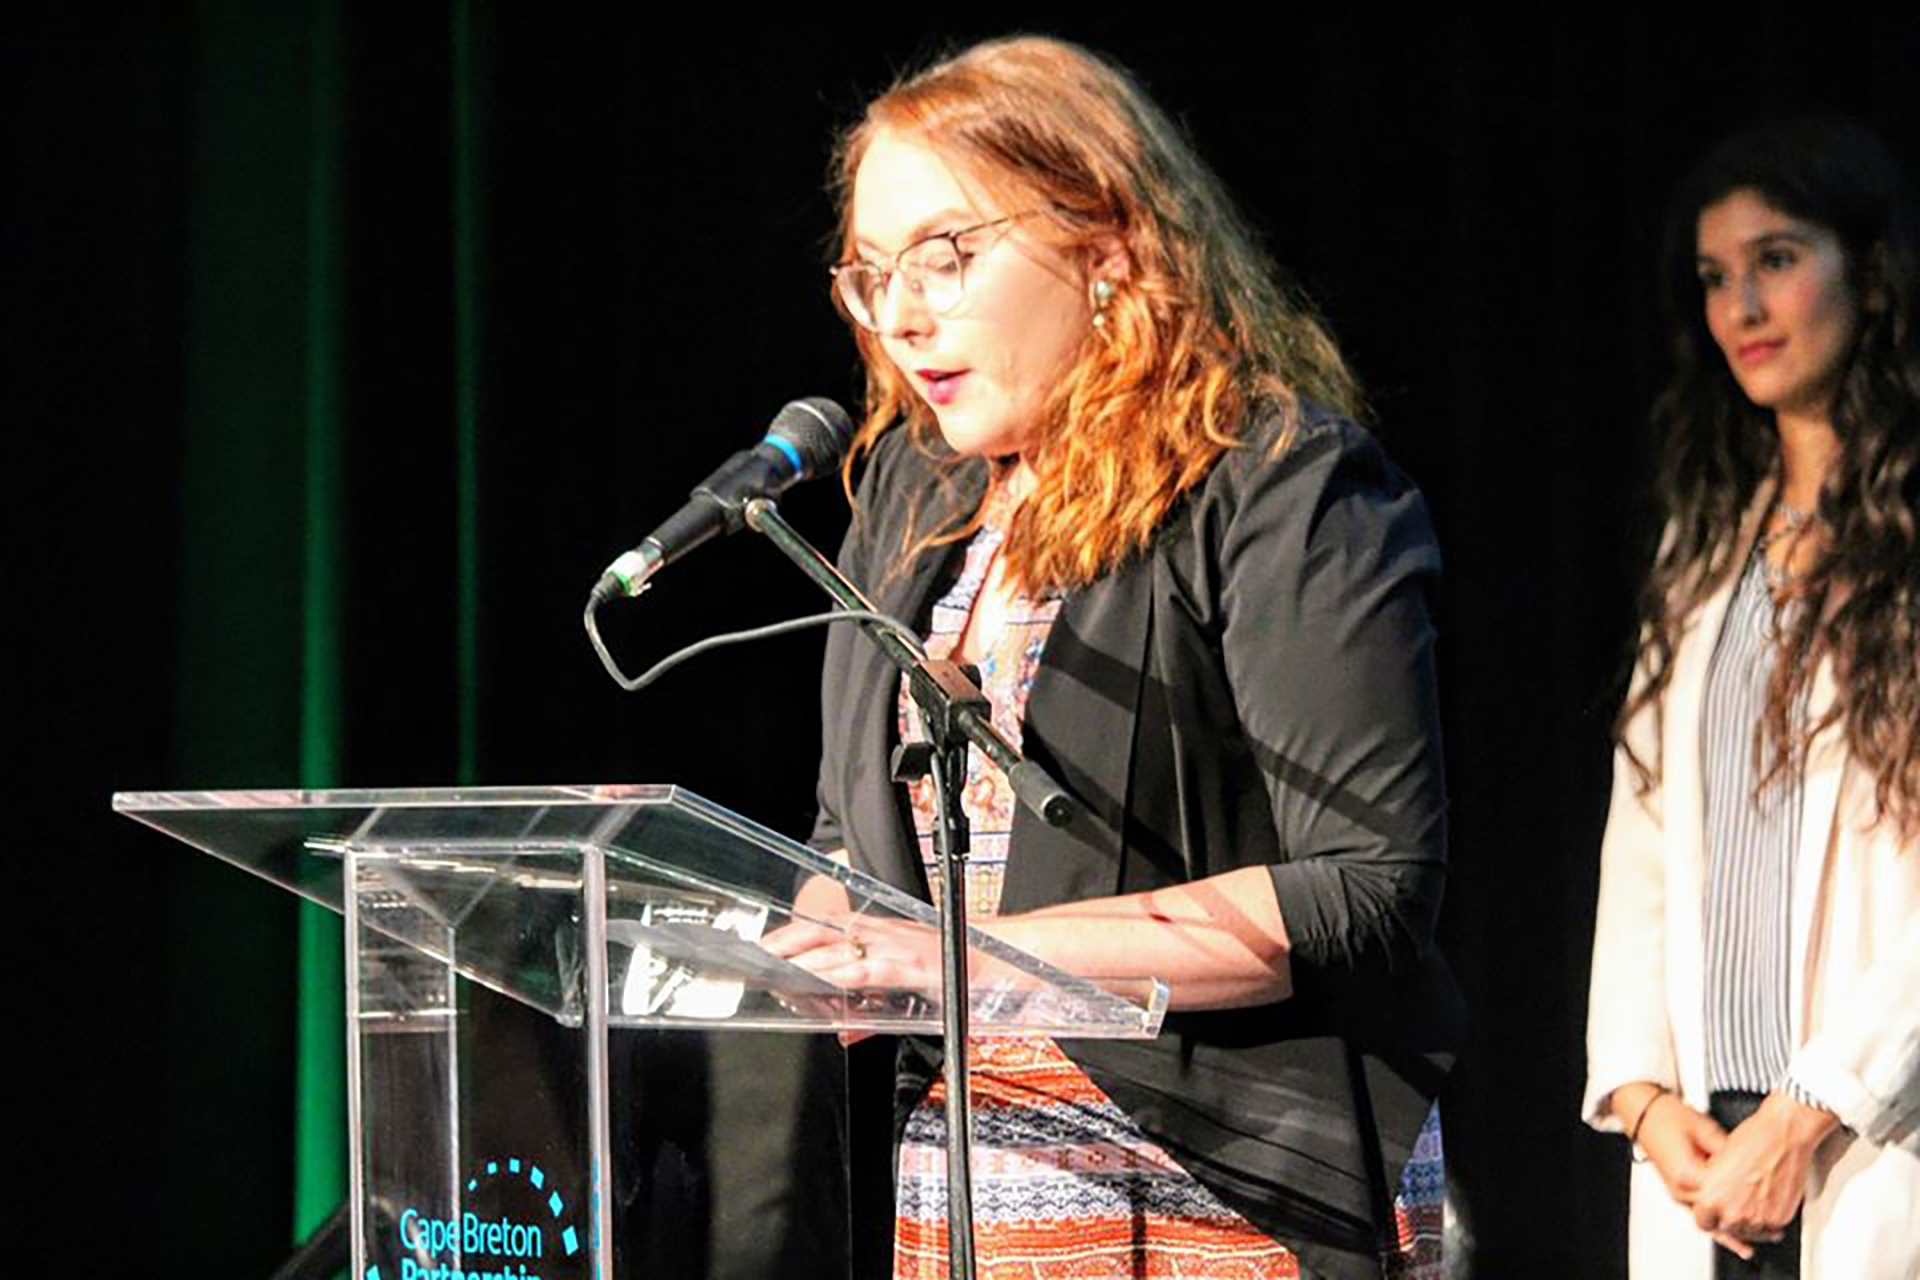 Savannah Anderson - Vital Awards